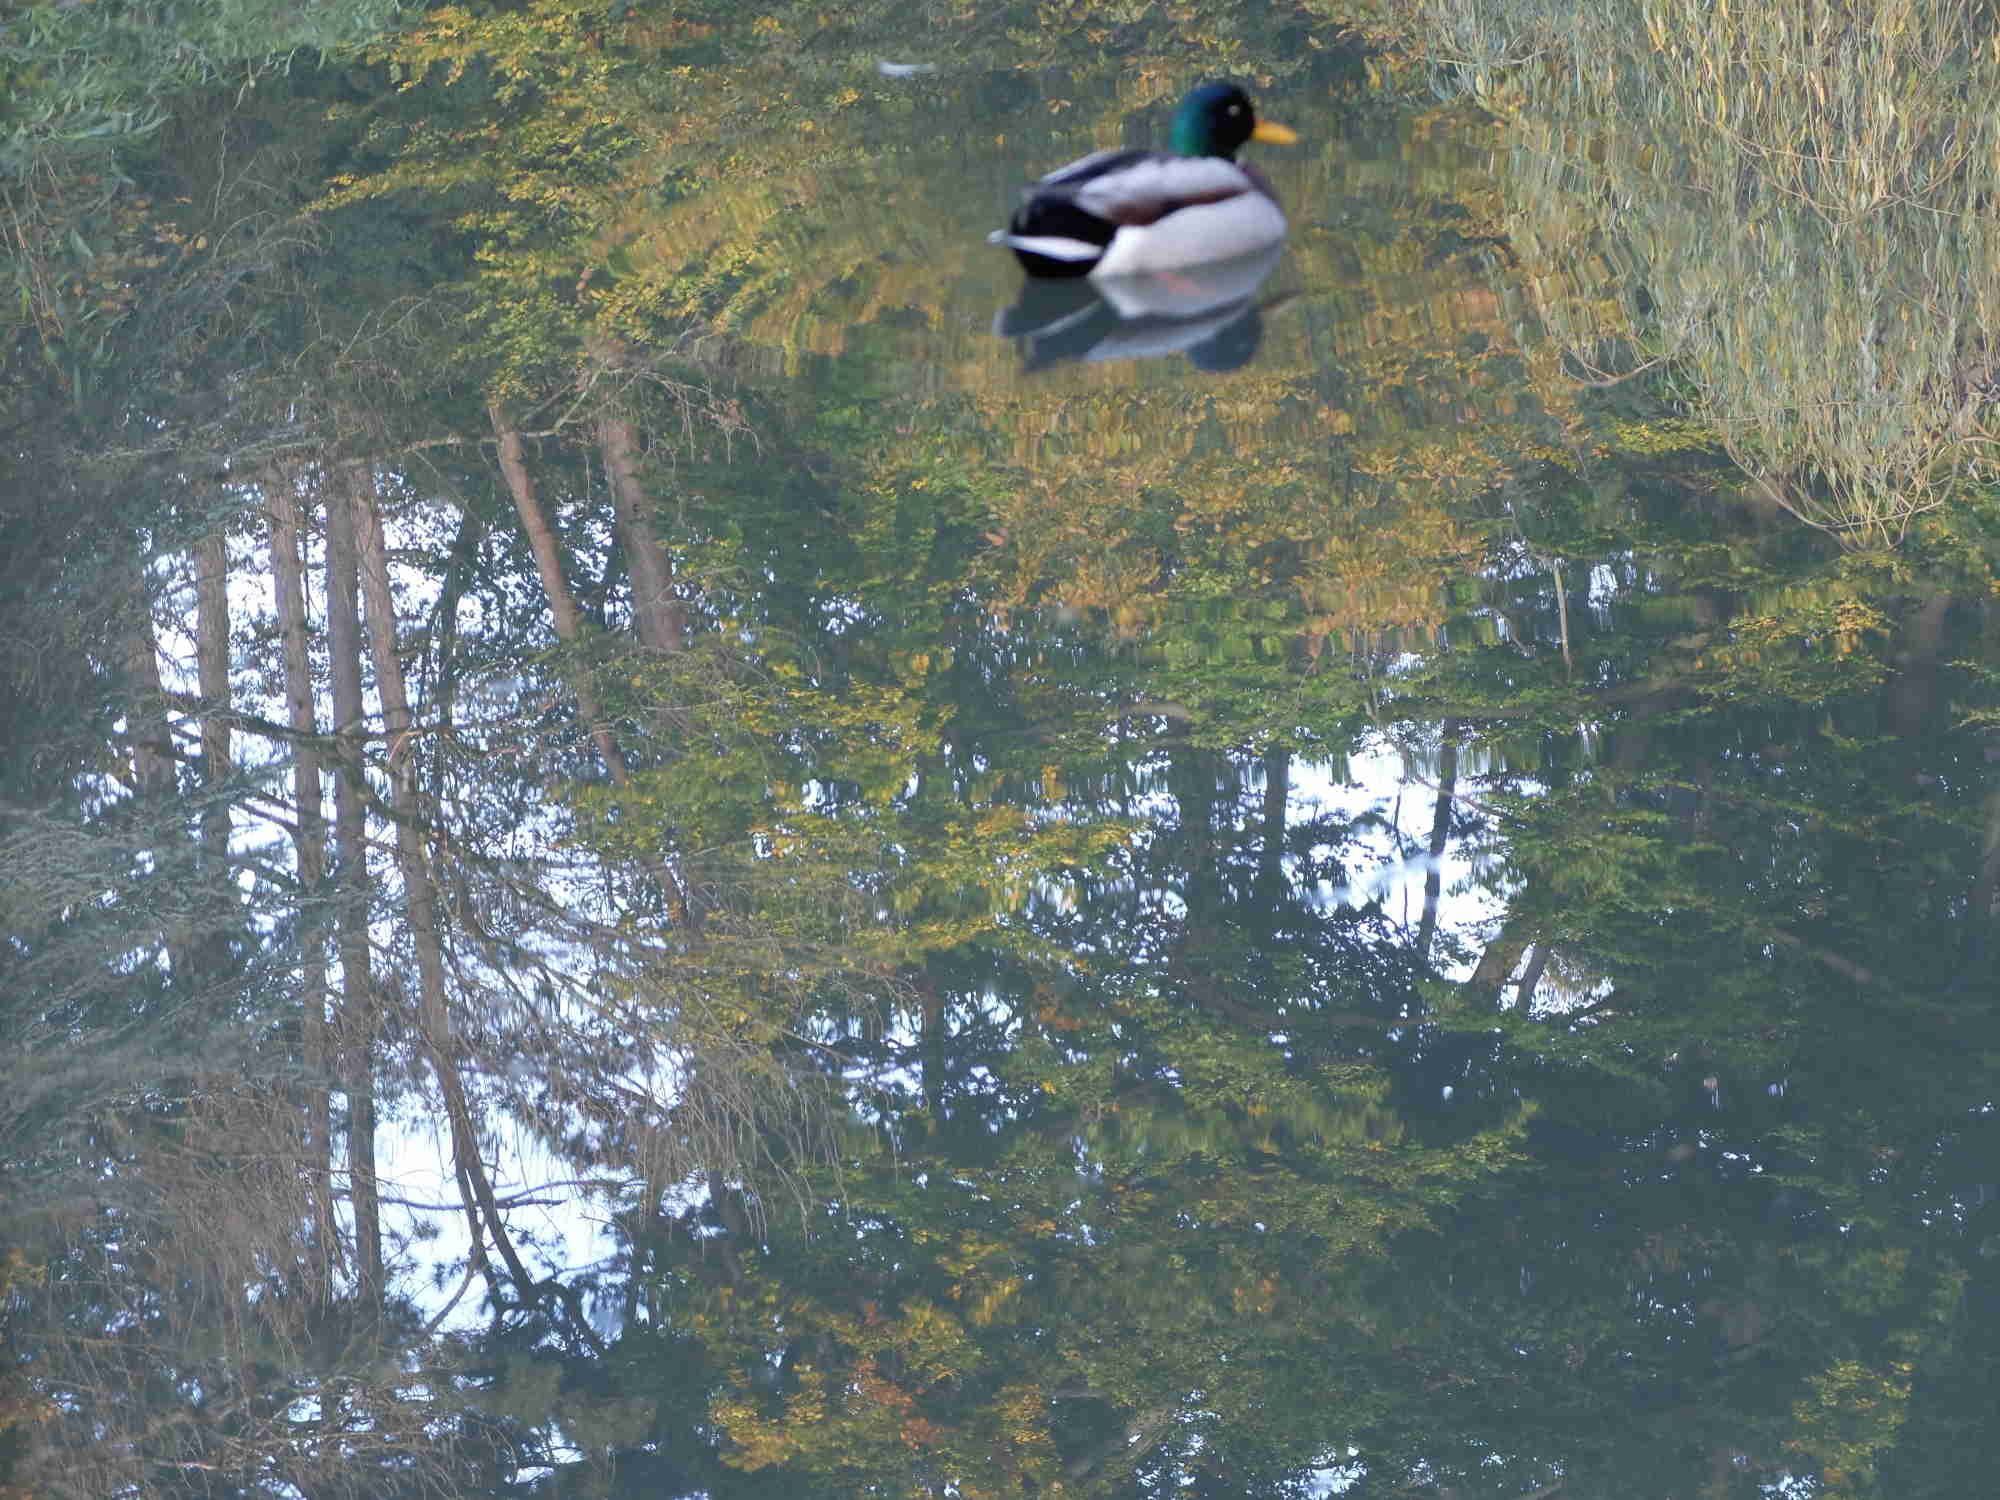 Canard dans les reflets